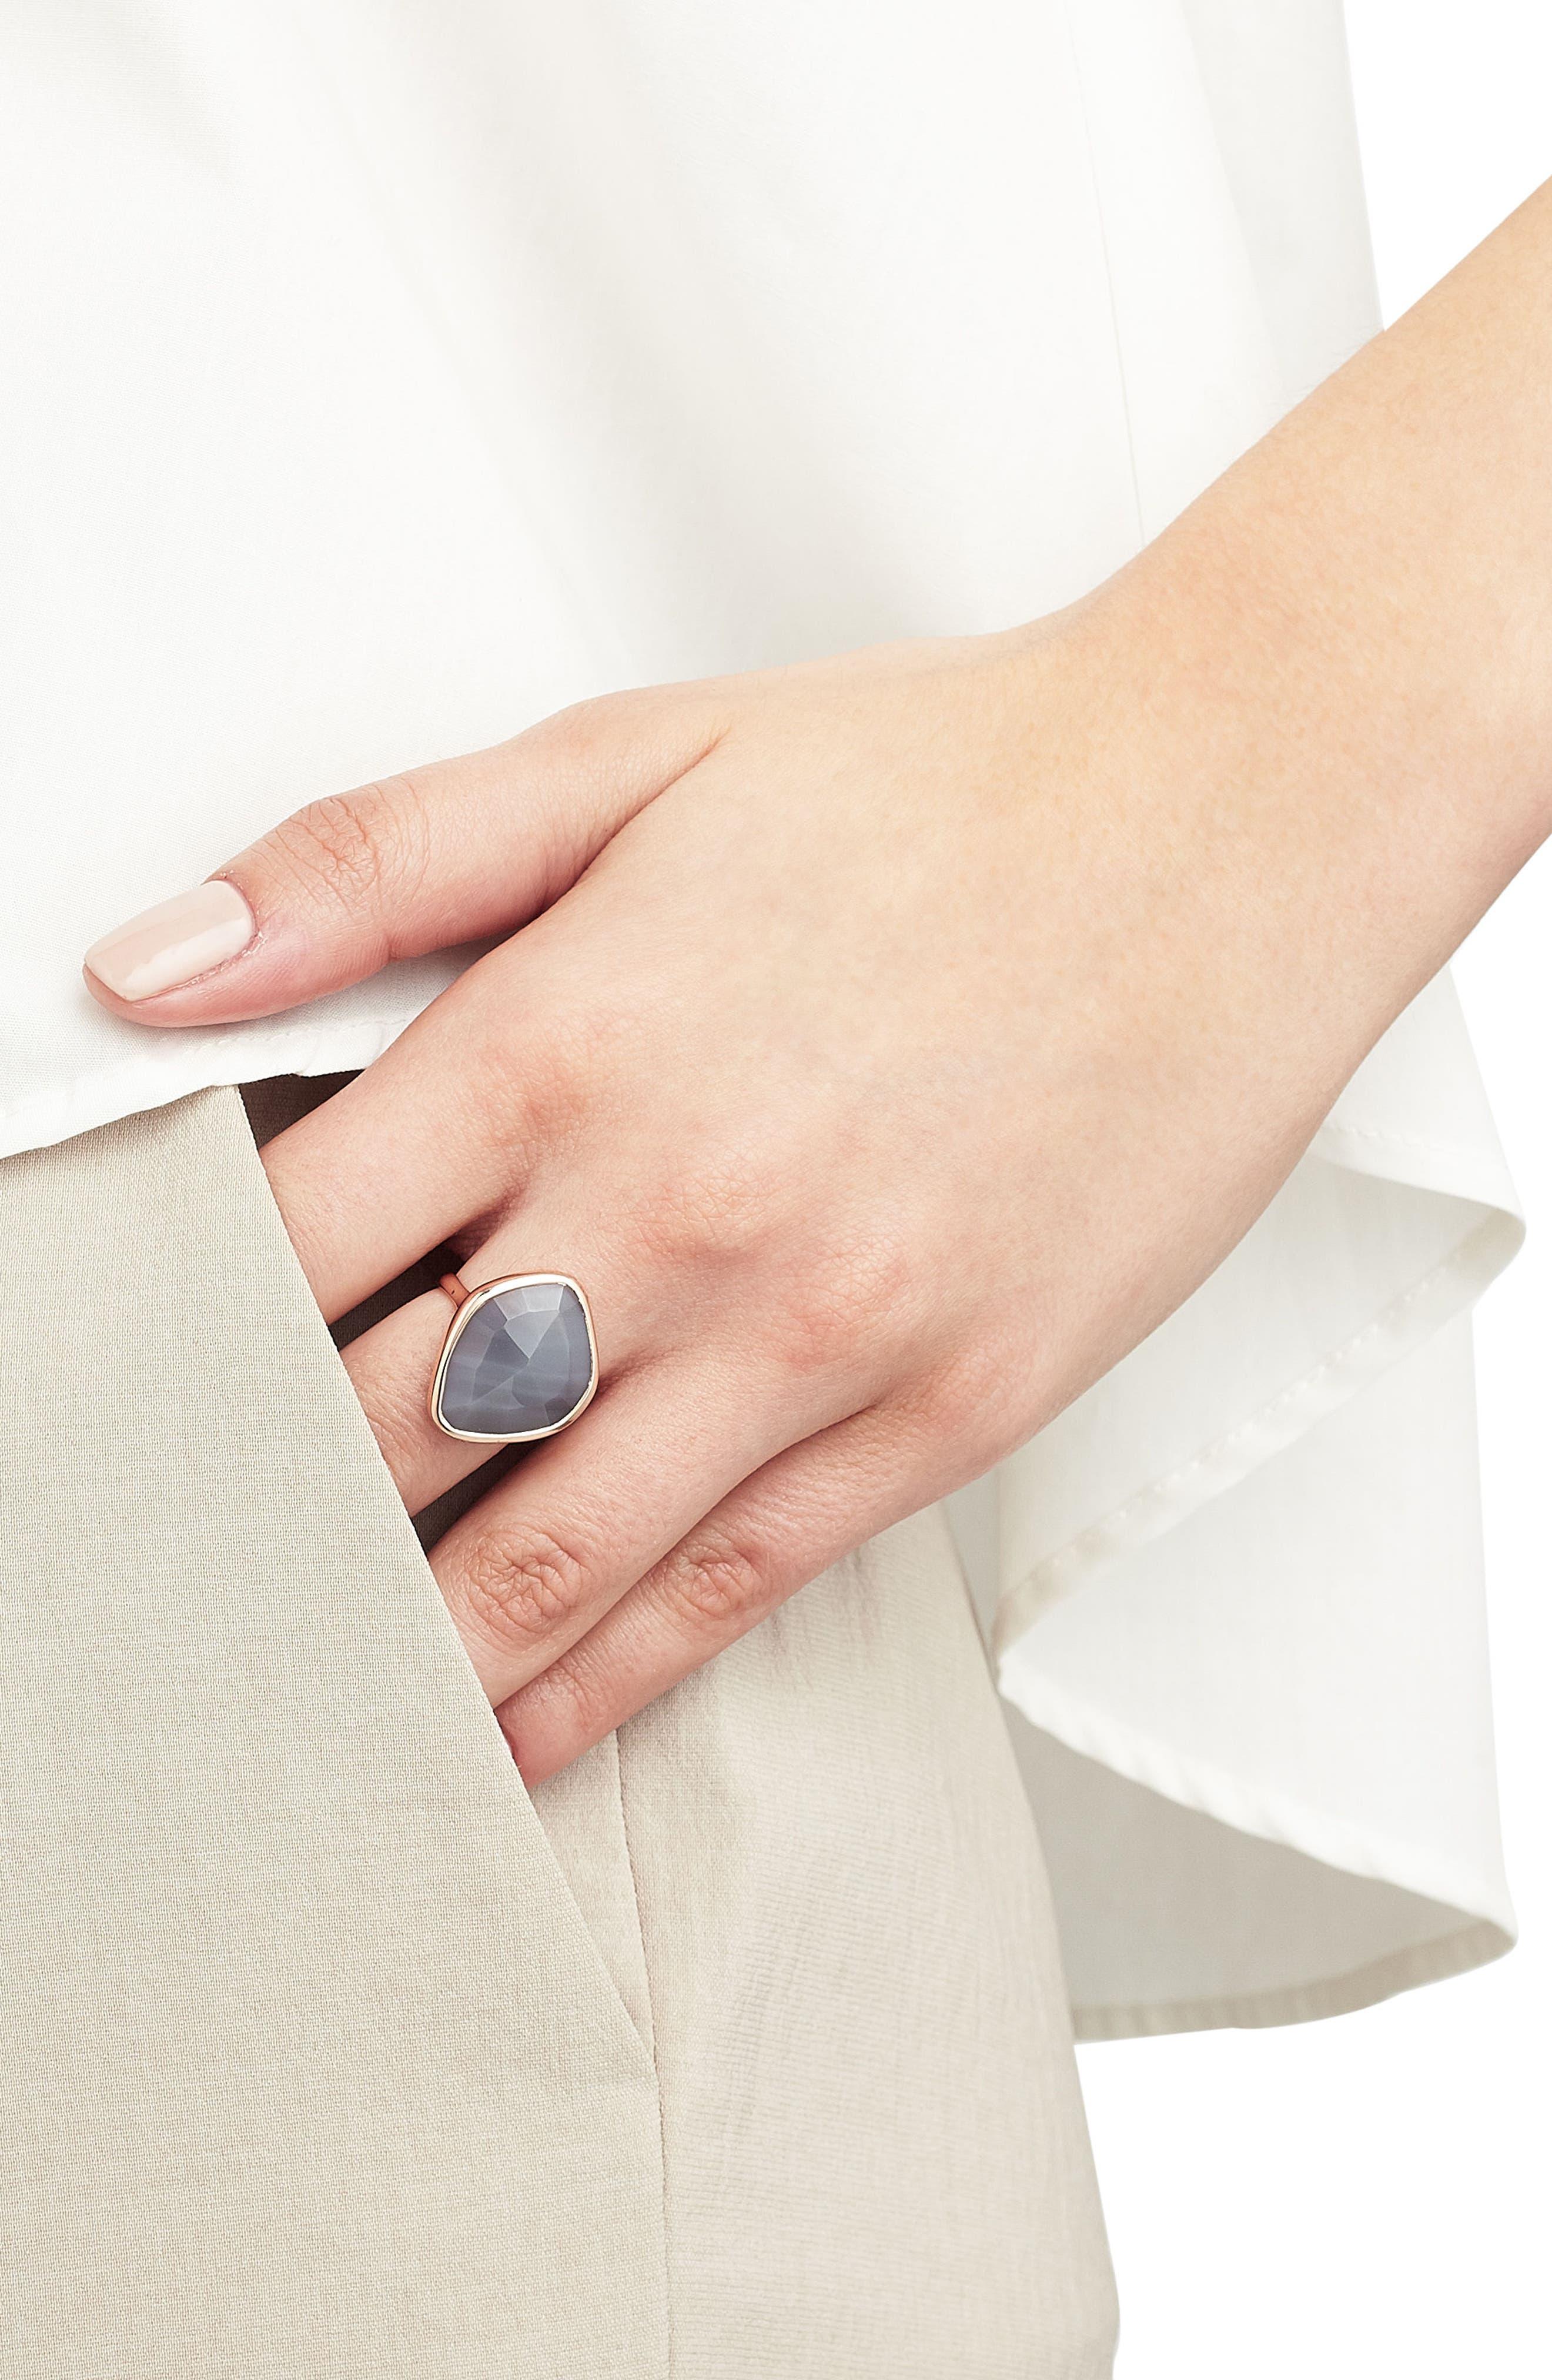 Siren Nugget Semiprecious Stone Ring,                             Alternate thumbnail 2, color,                             Grey Agate/ Rose Gold